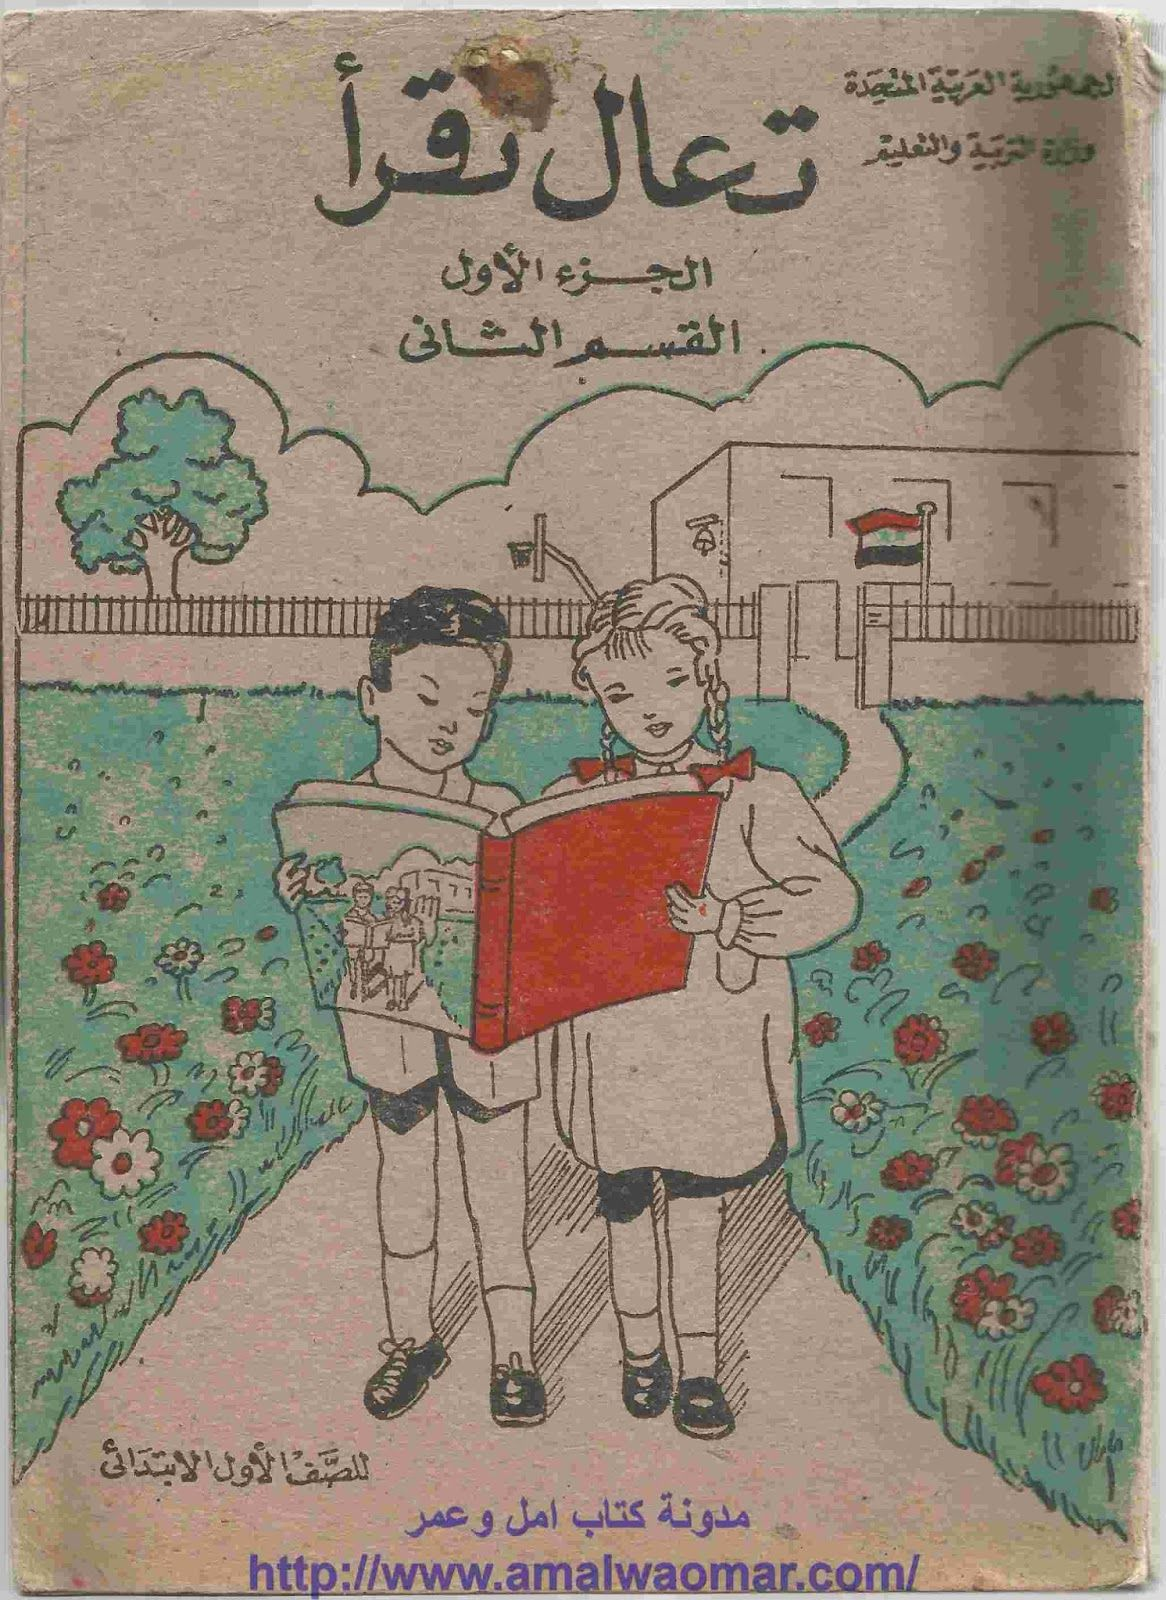 كتاب امل وعمر تحميل كتاب القراءة سوسن ونصر Vintage World Maps Books Map